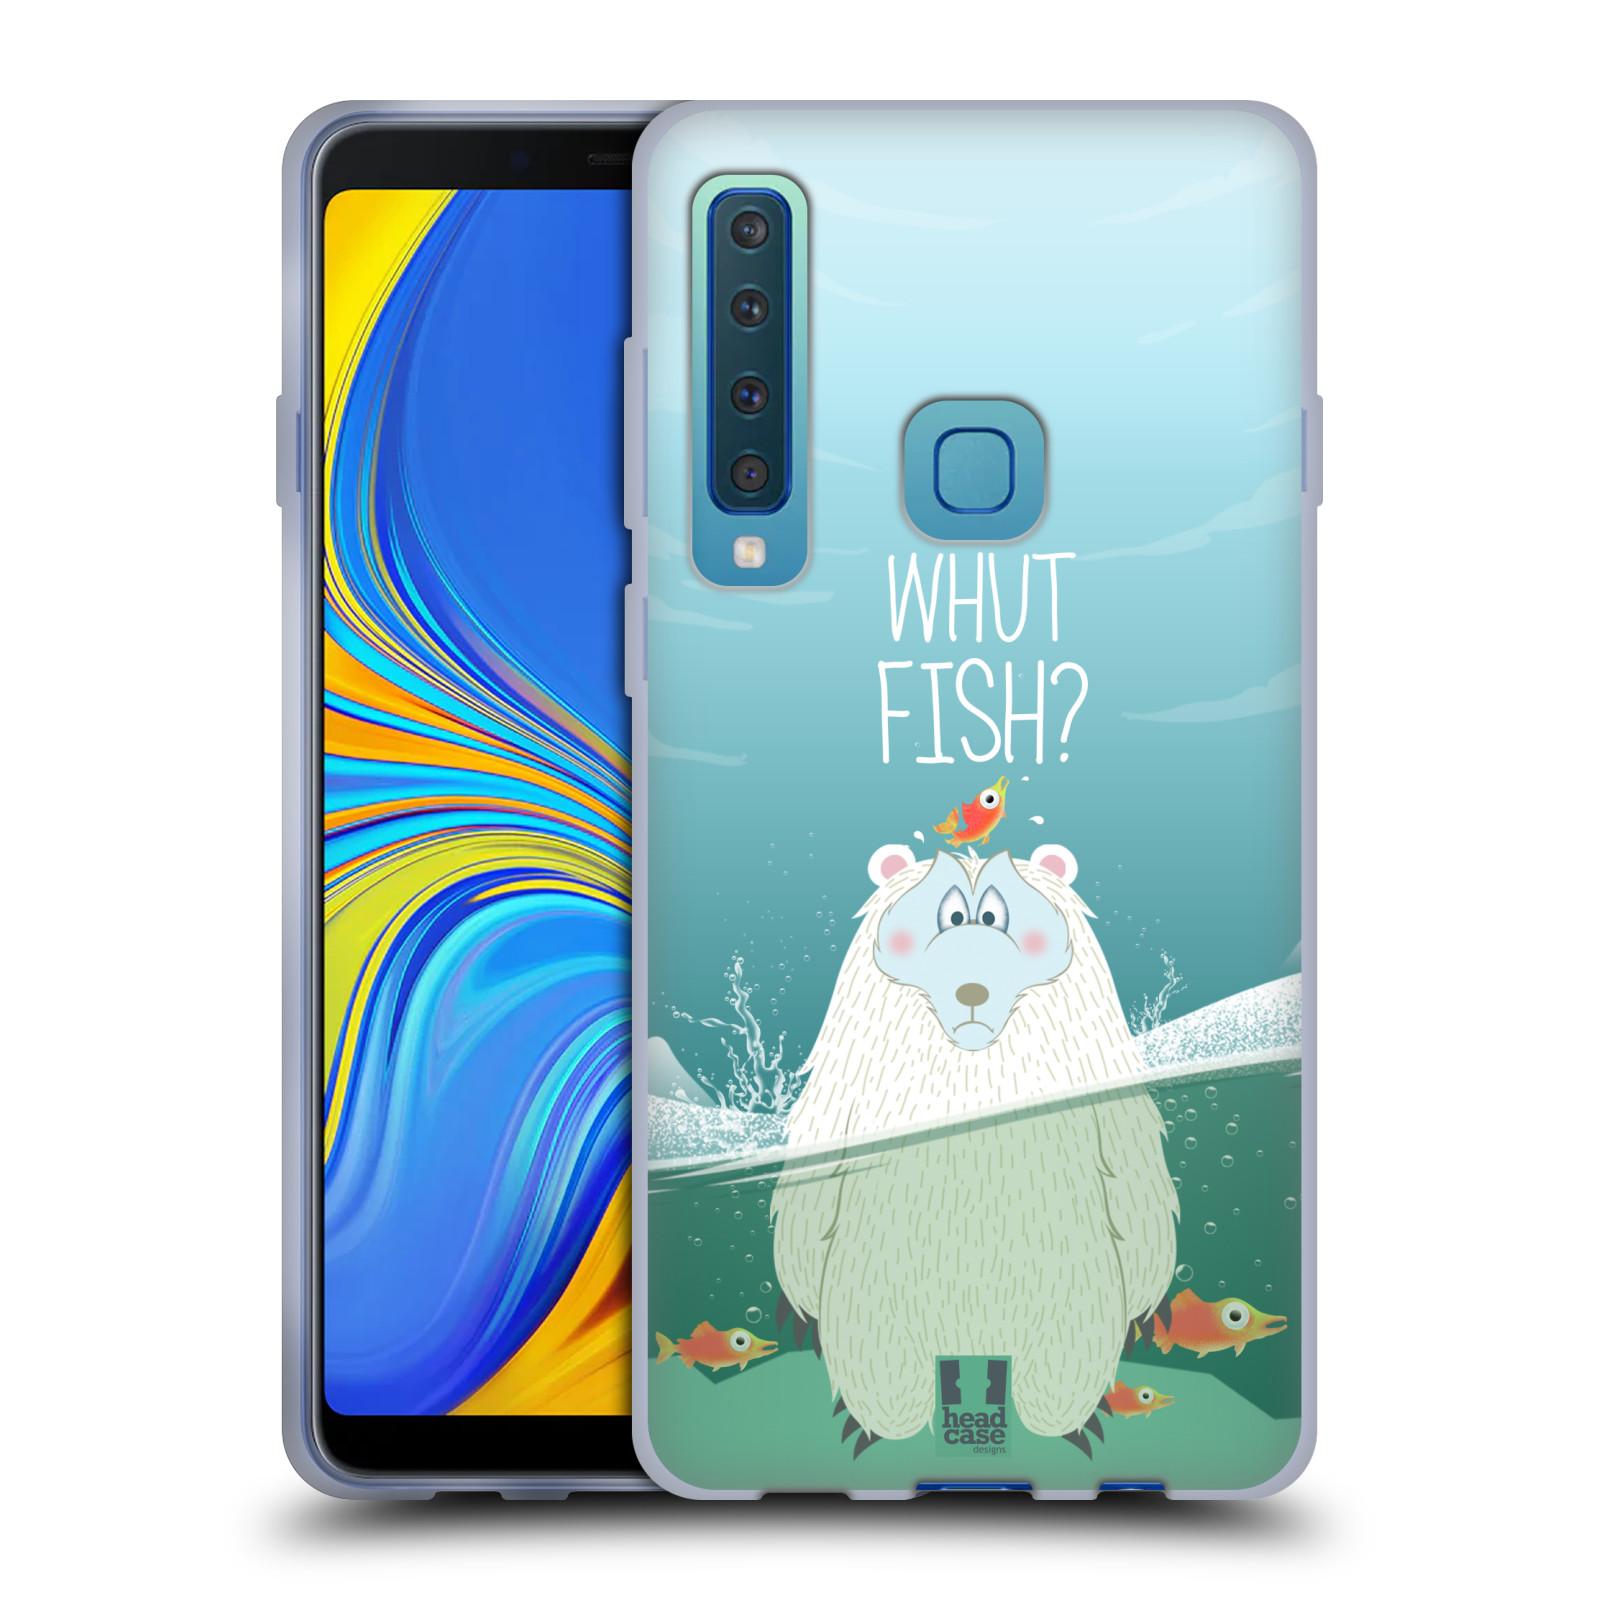 Silikonové pouzdro na mobil Samsung Galaxy A9 (2018) - Head Case - Medvěd Whut Fish?